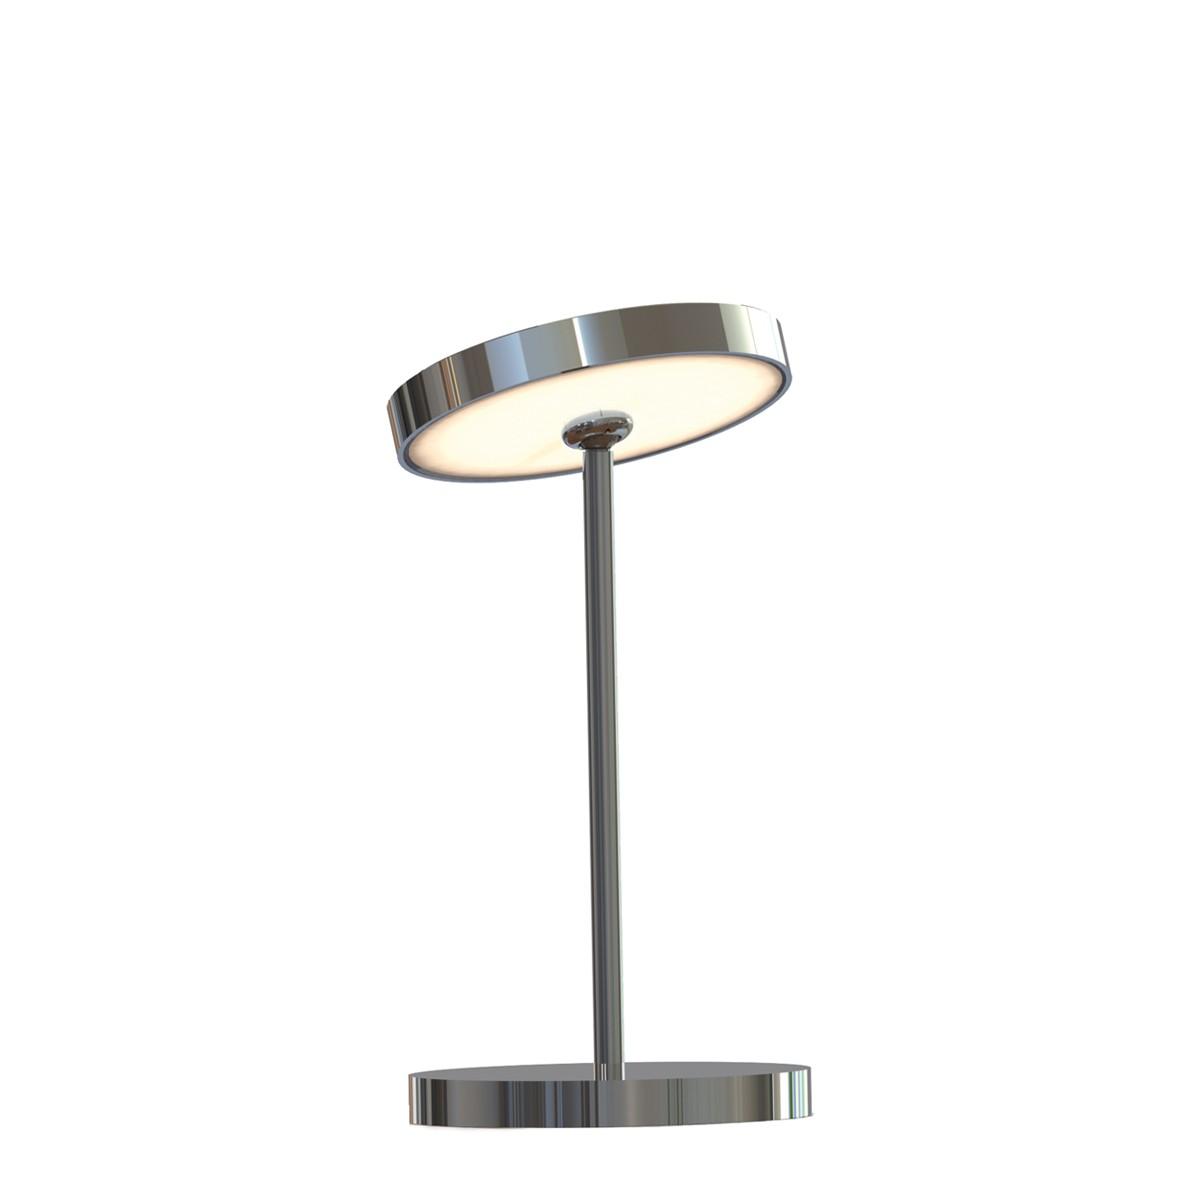 Top Light Sun Table Tischleuchte 20, Ø: 13 cm